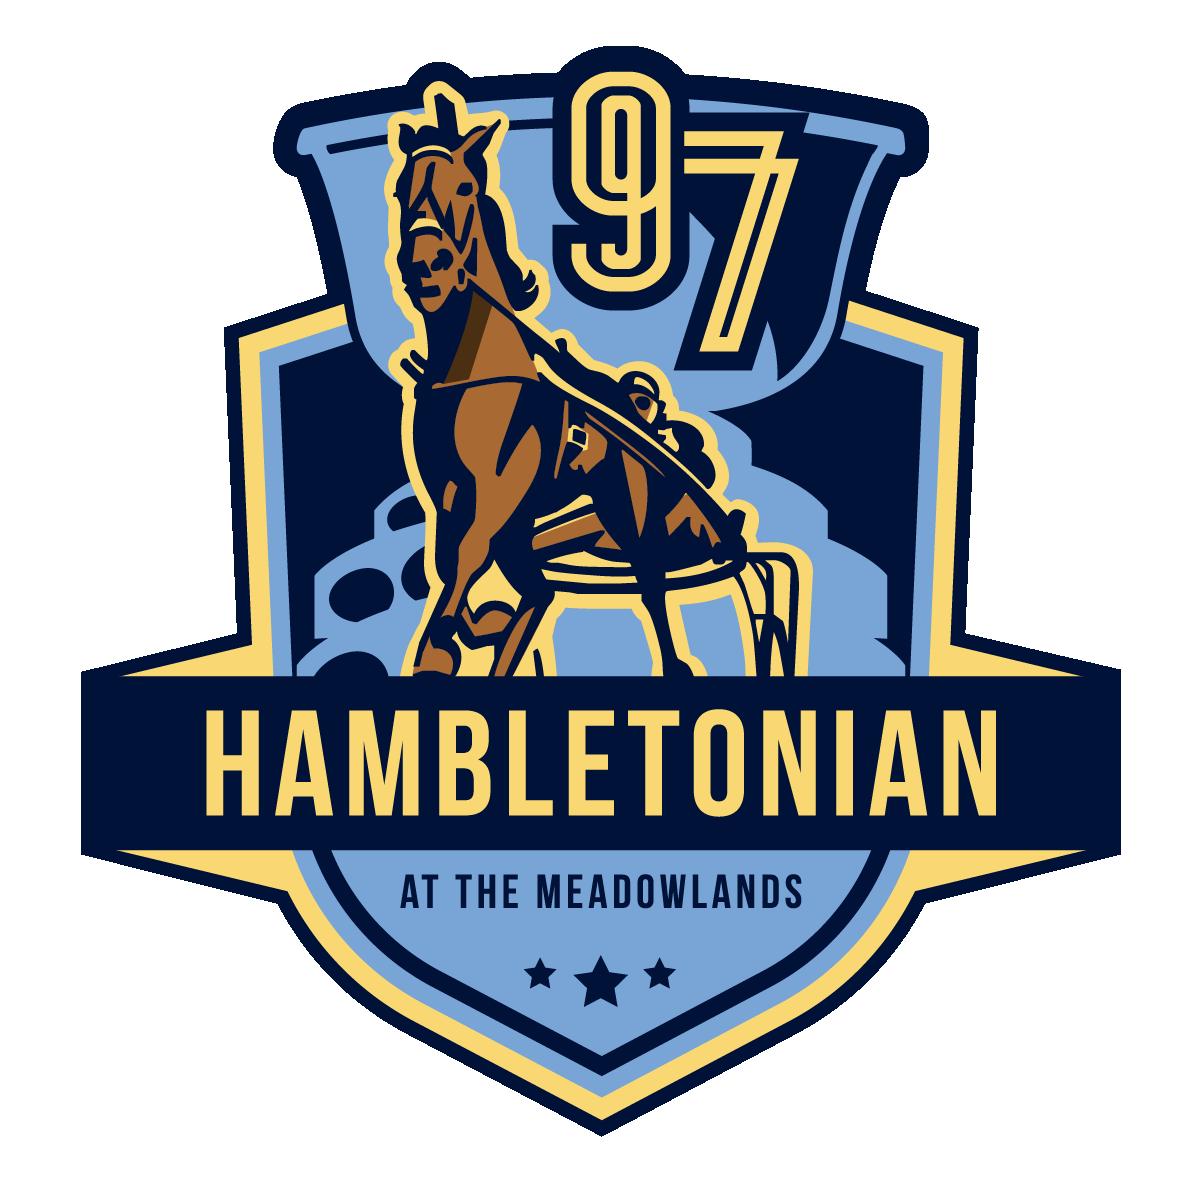 Hambletonian Shop